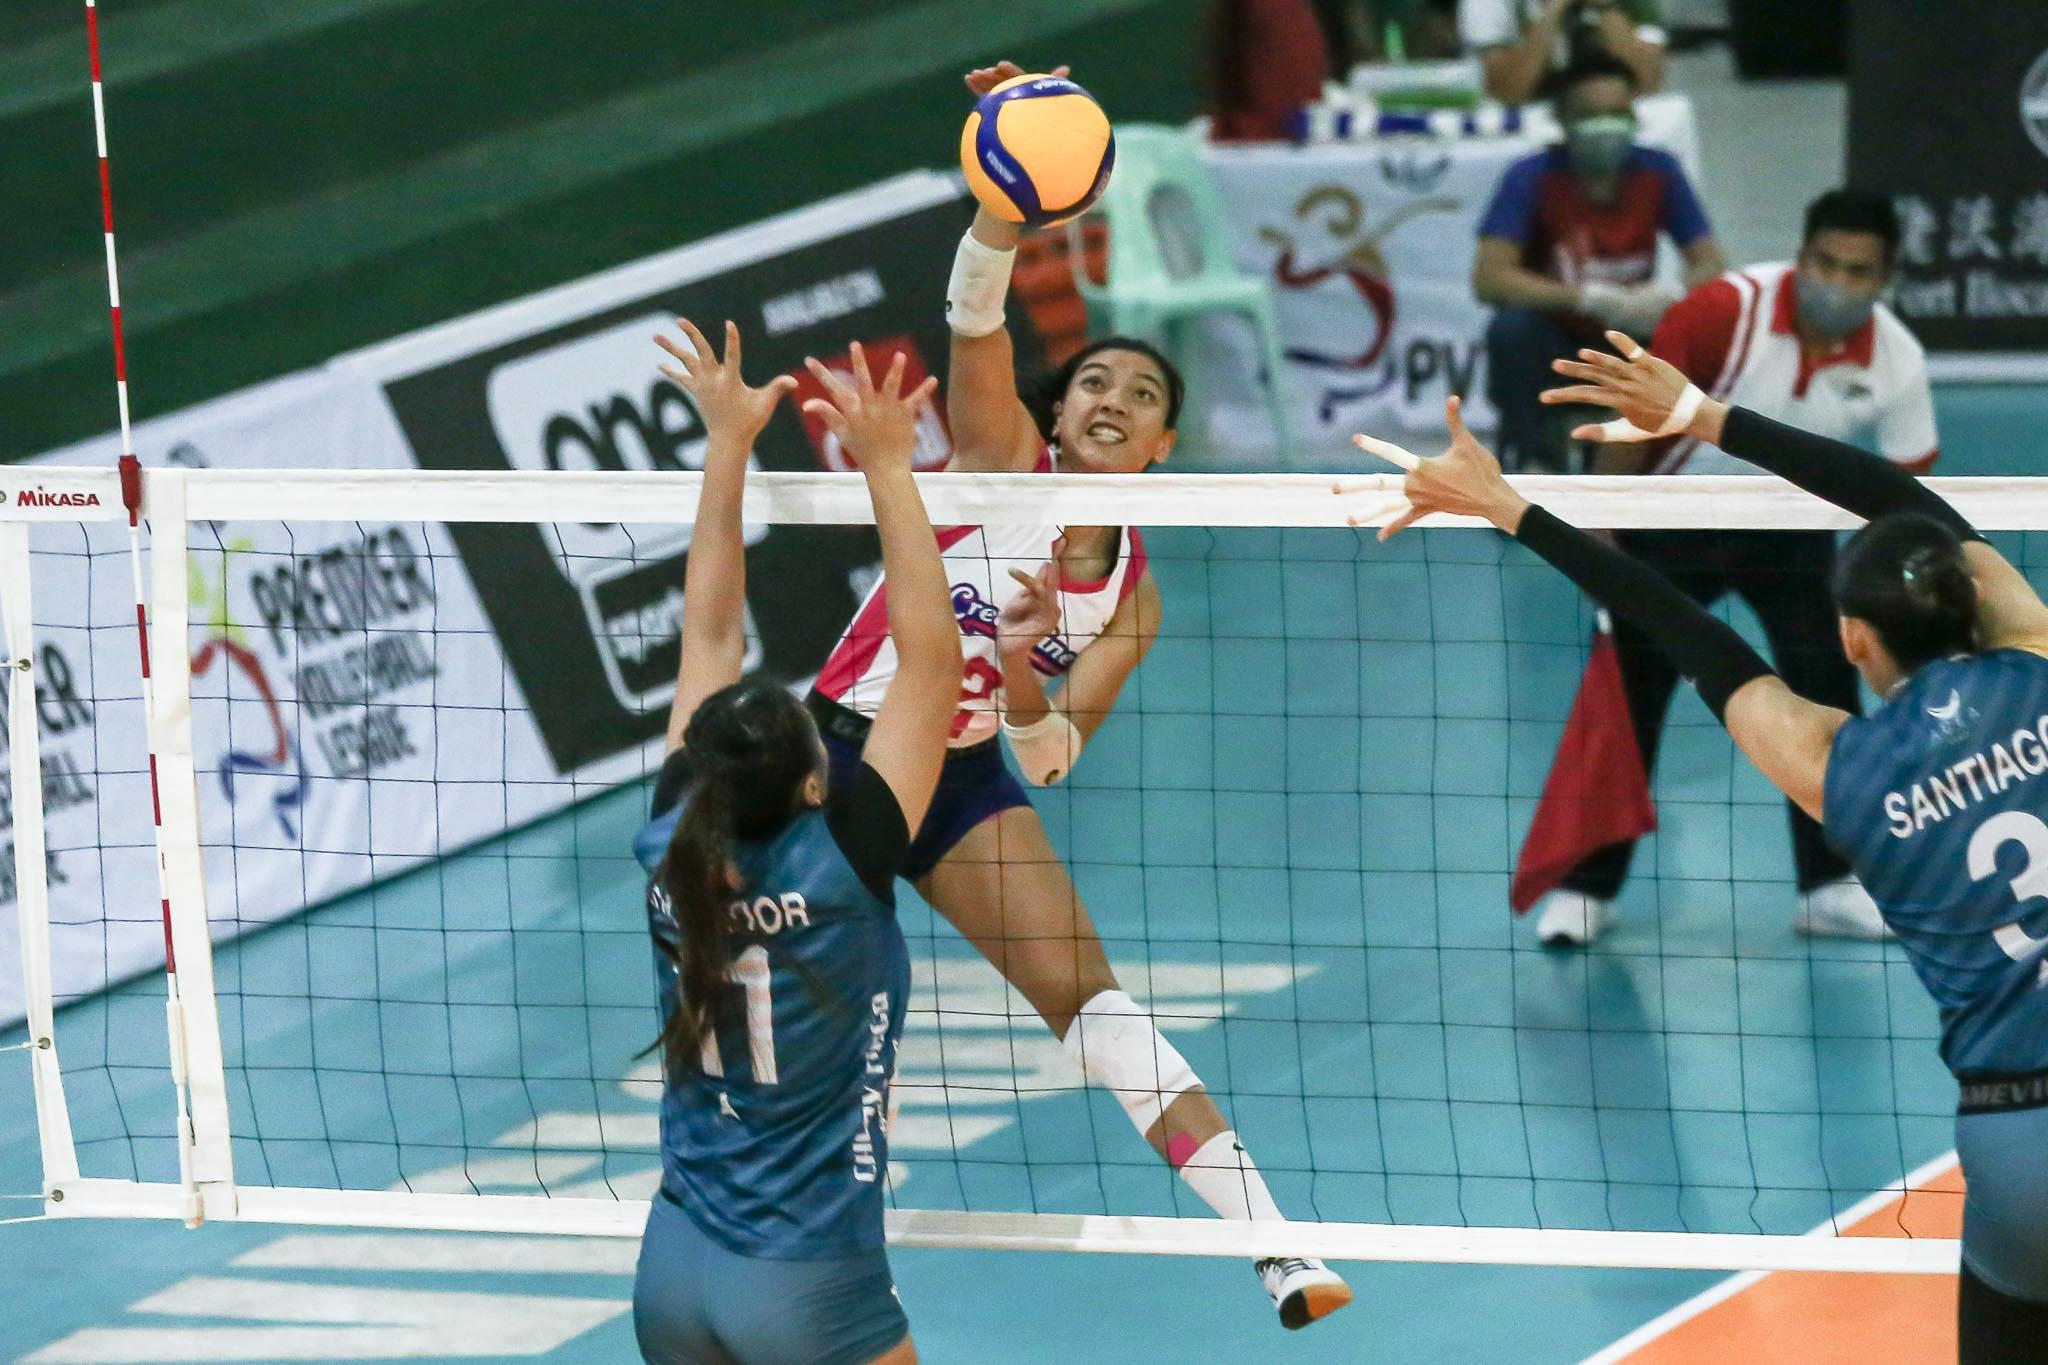 2021-PVL-OPEN-Creamline-vs-Chery-Valdez-Creamline Jaja Santiago on facing Alyssa Valdez again: 'Nakaka-miss' News PVL Volleyball  - philippine sports news